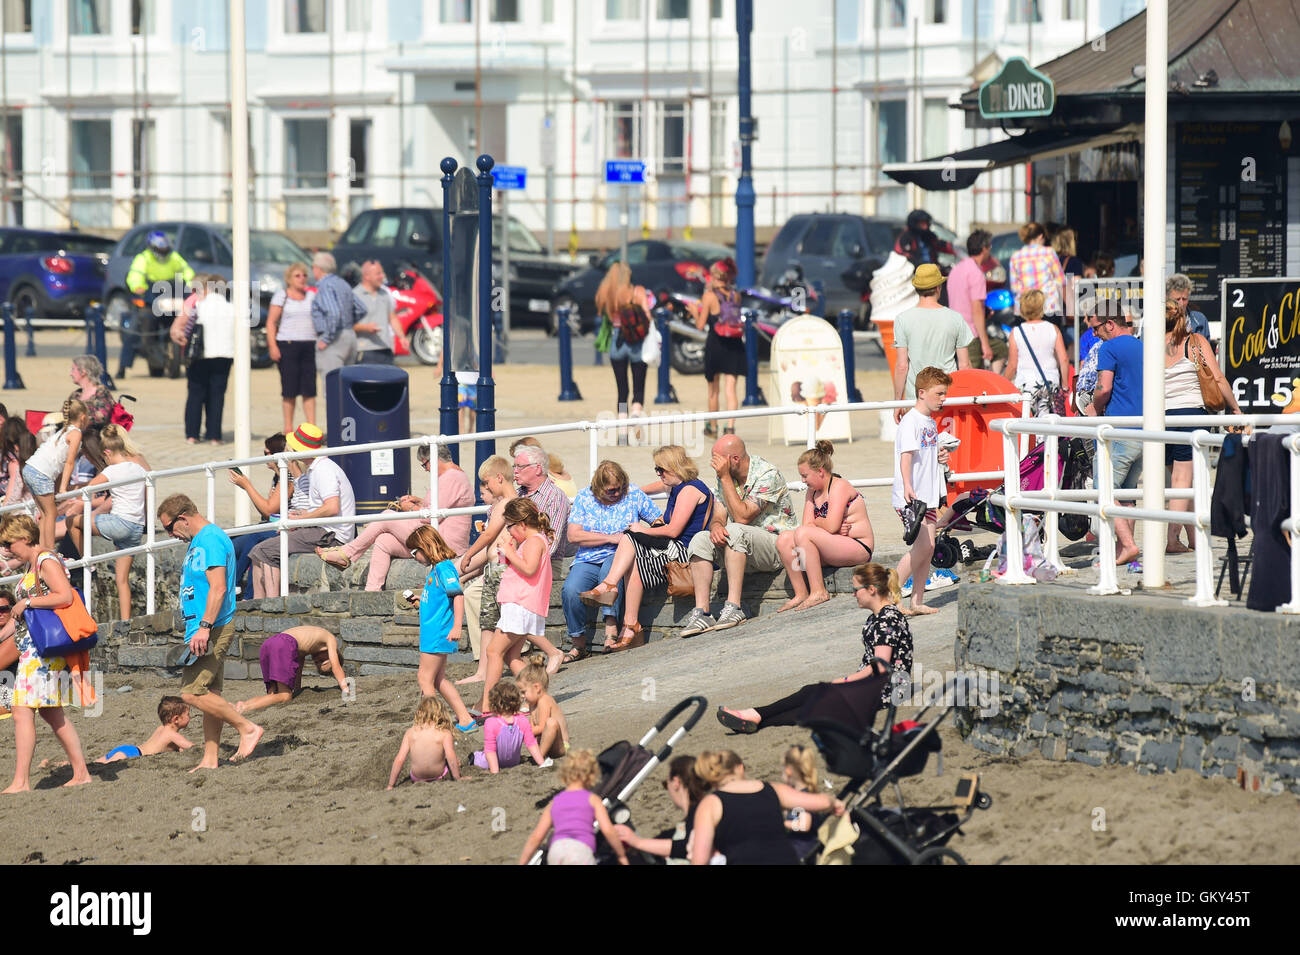 Aberystwyth, Wales, UK. 23rd Aug, 2016. UK weather: People enjoying a return to warm sunny weather at the seaside - Stock Image